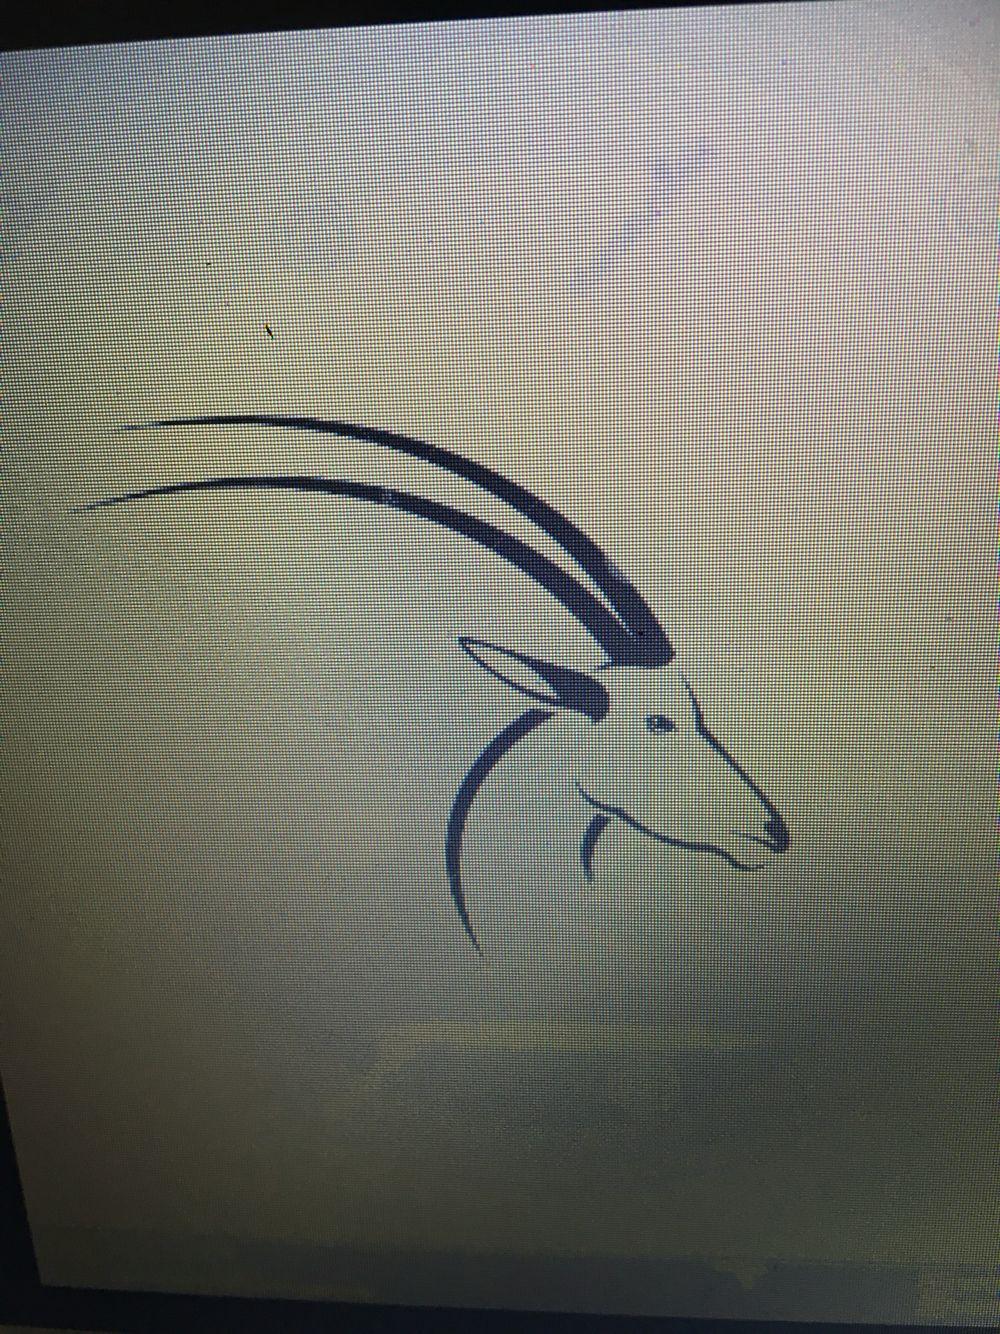 Songbird tattoo created at www mrsite com - Africa Tattoos